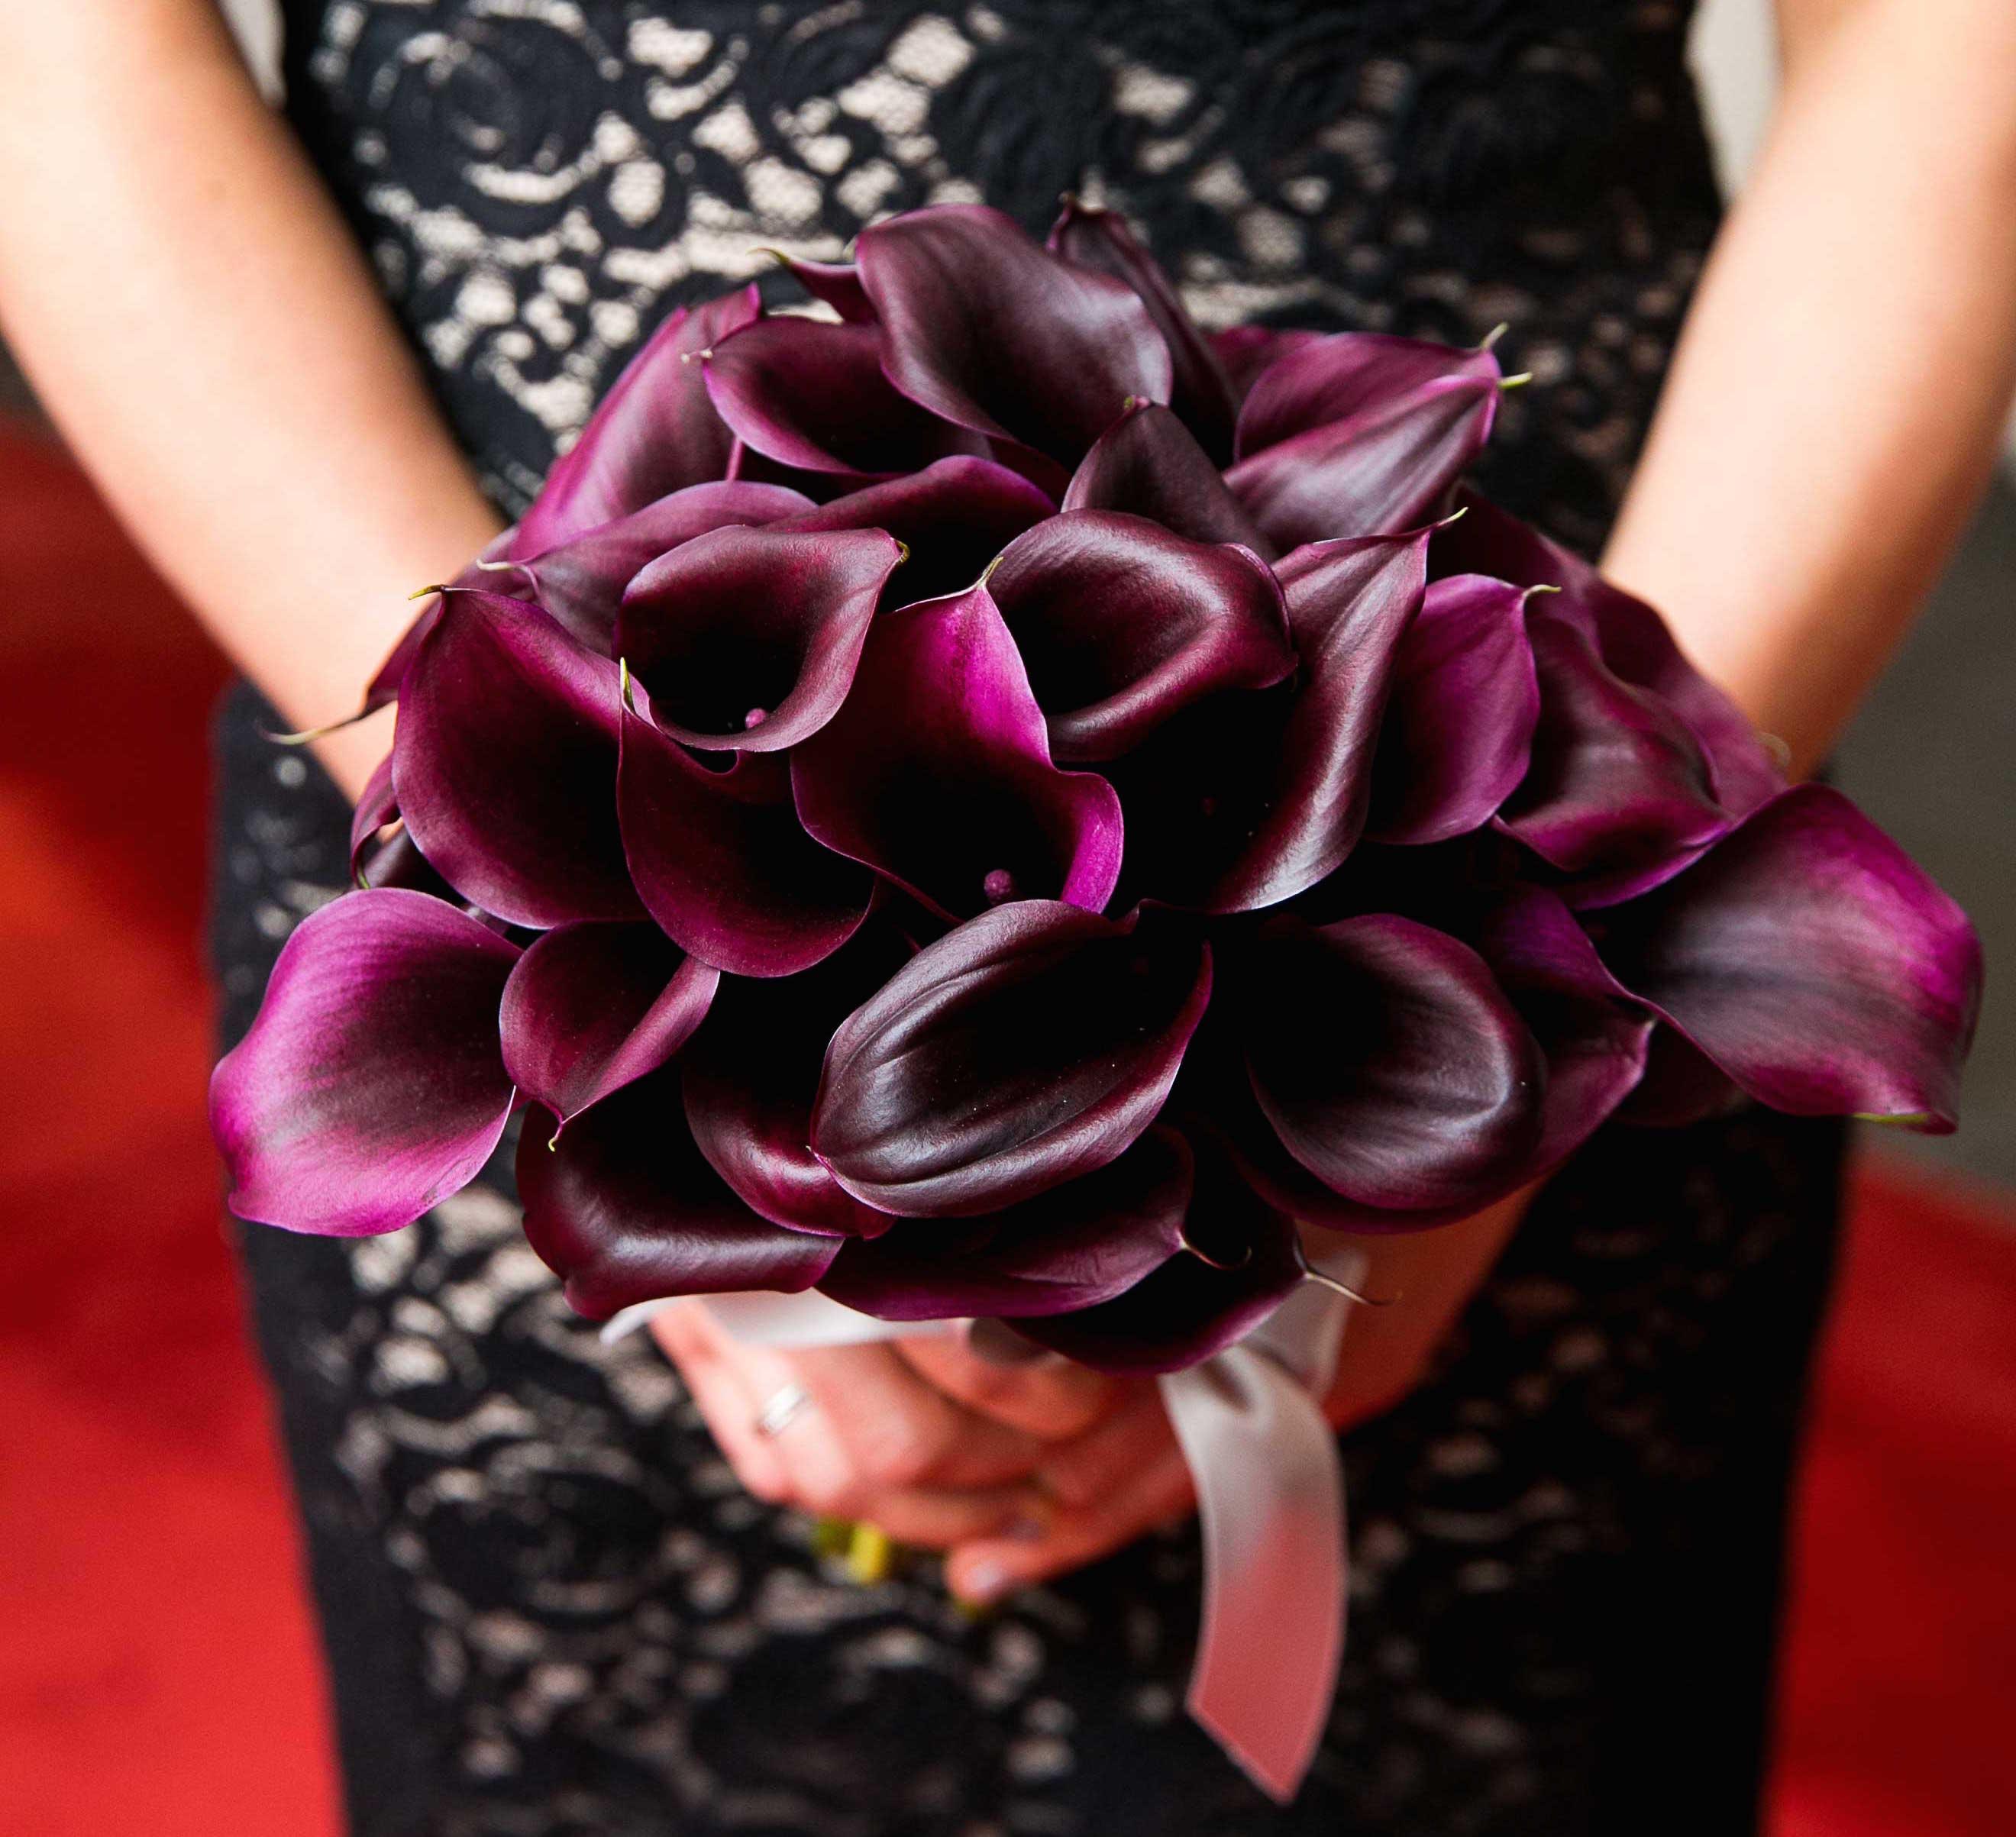 Bridesmaid dress dark black lace holding dark purple calla lily bouquet